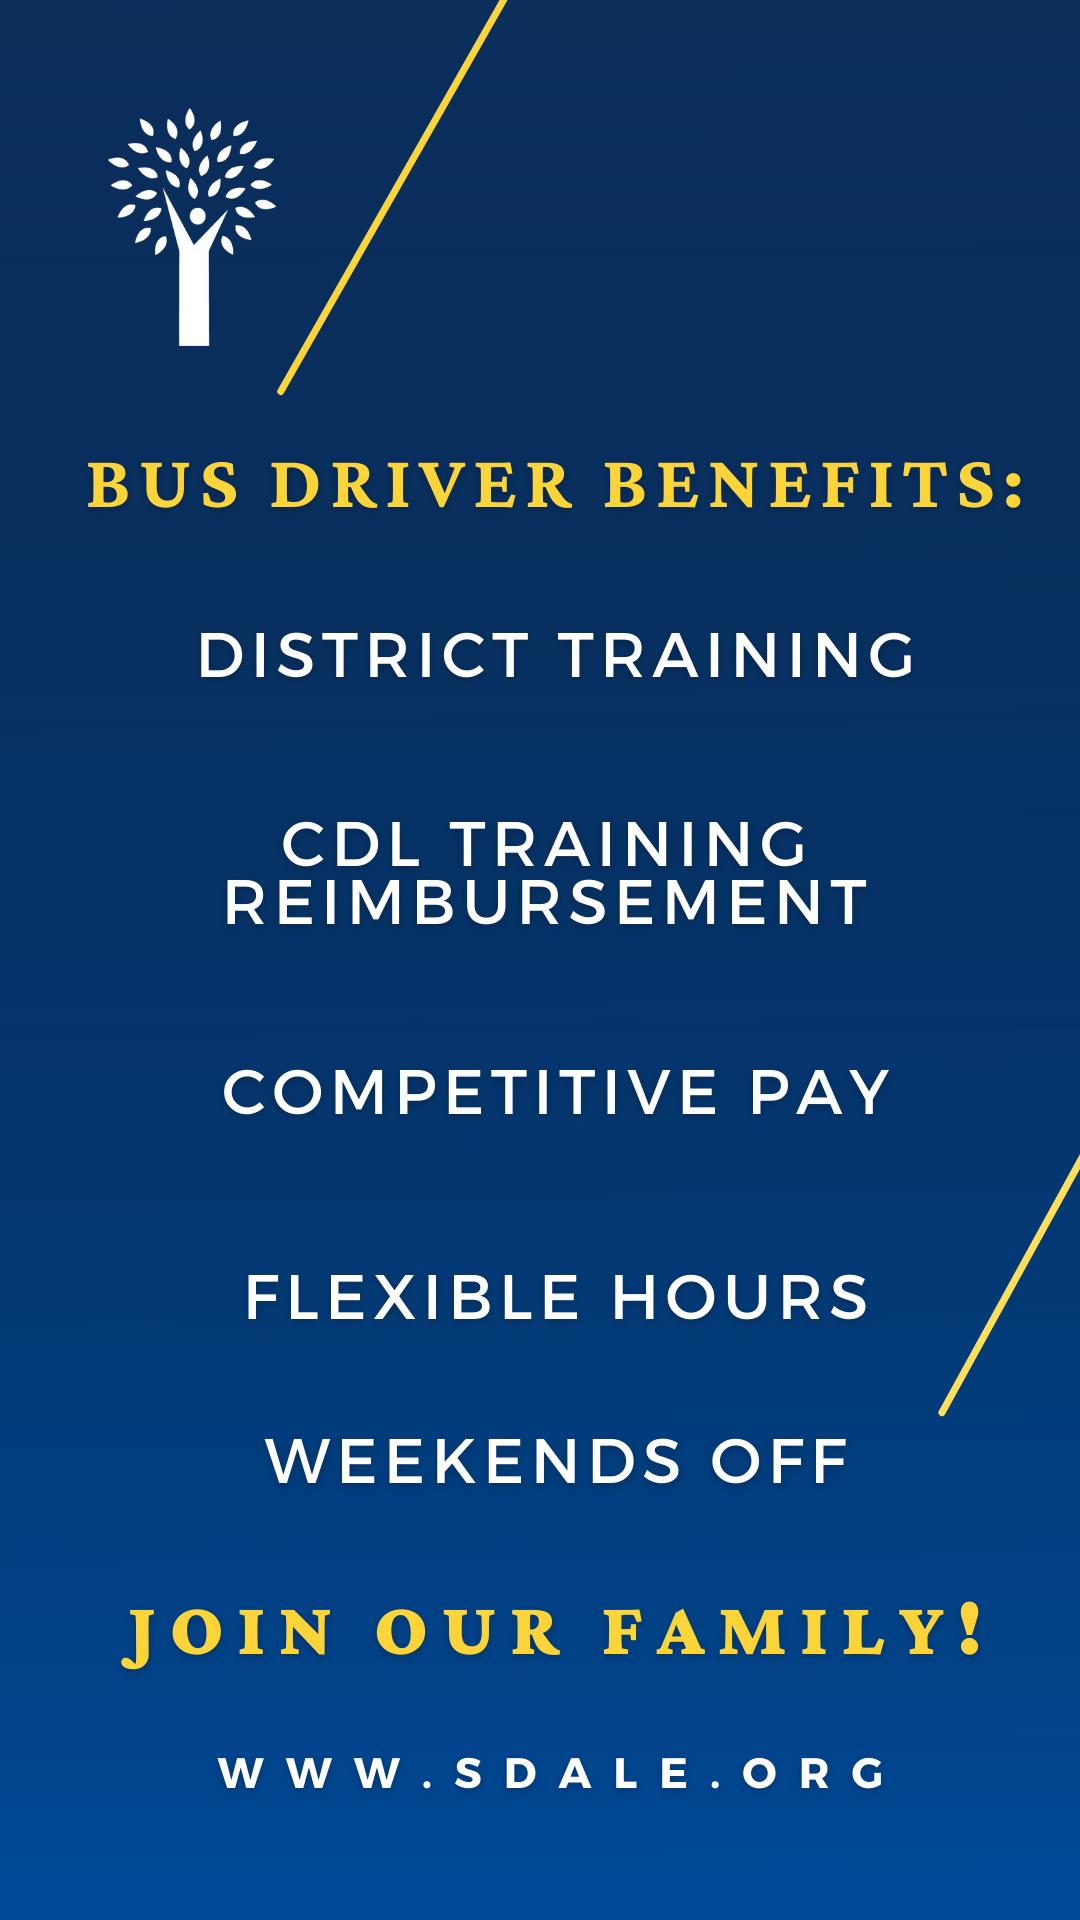 Bus Driver Benefits